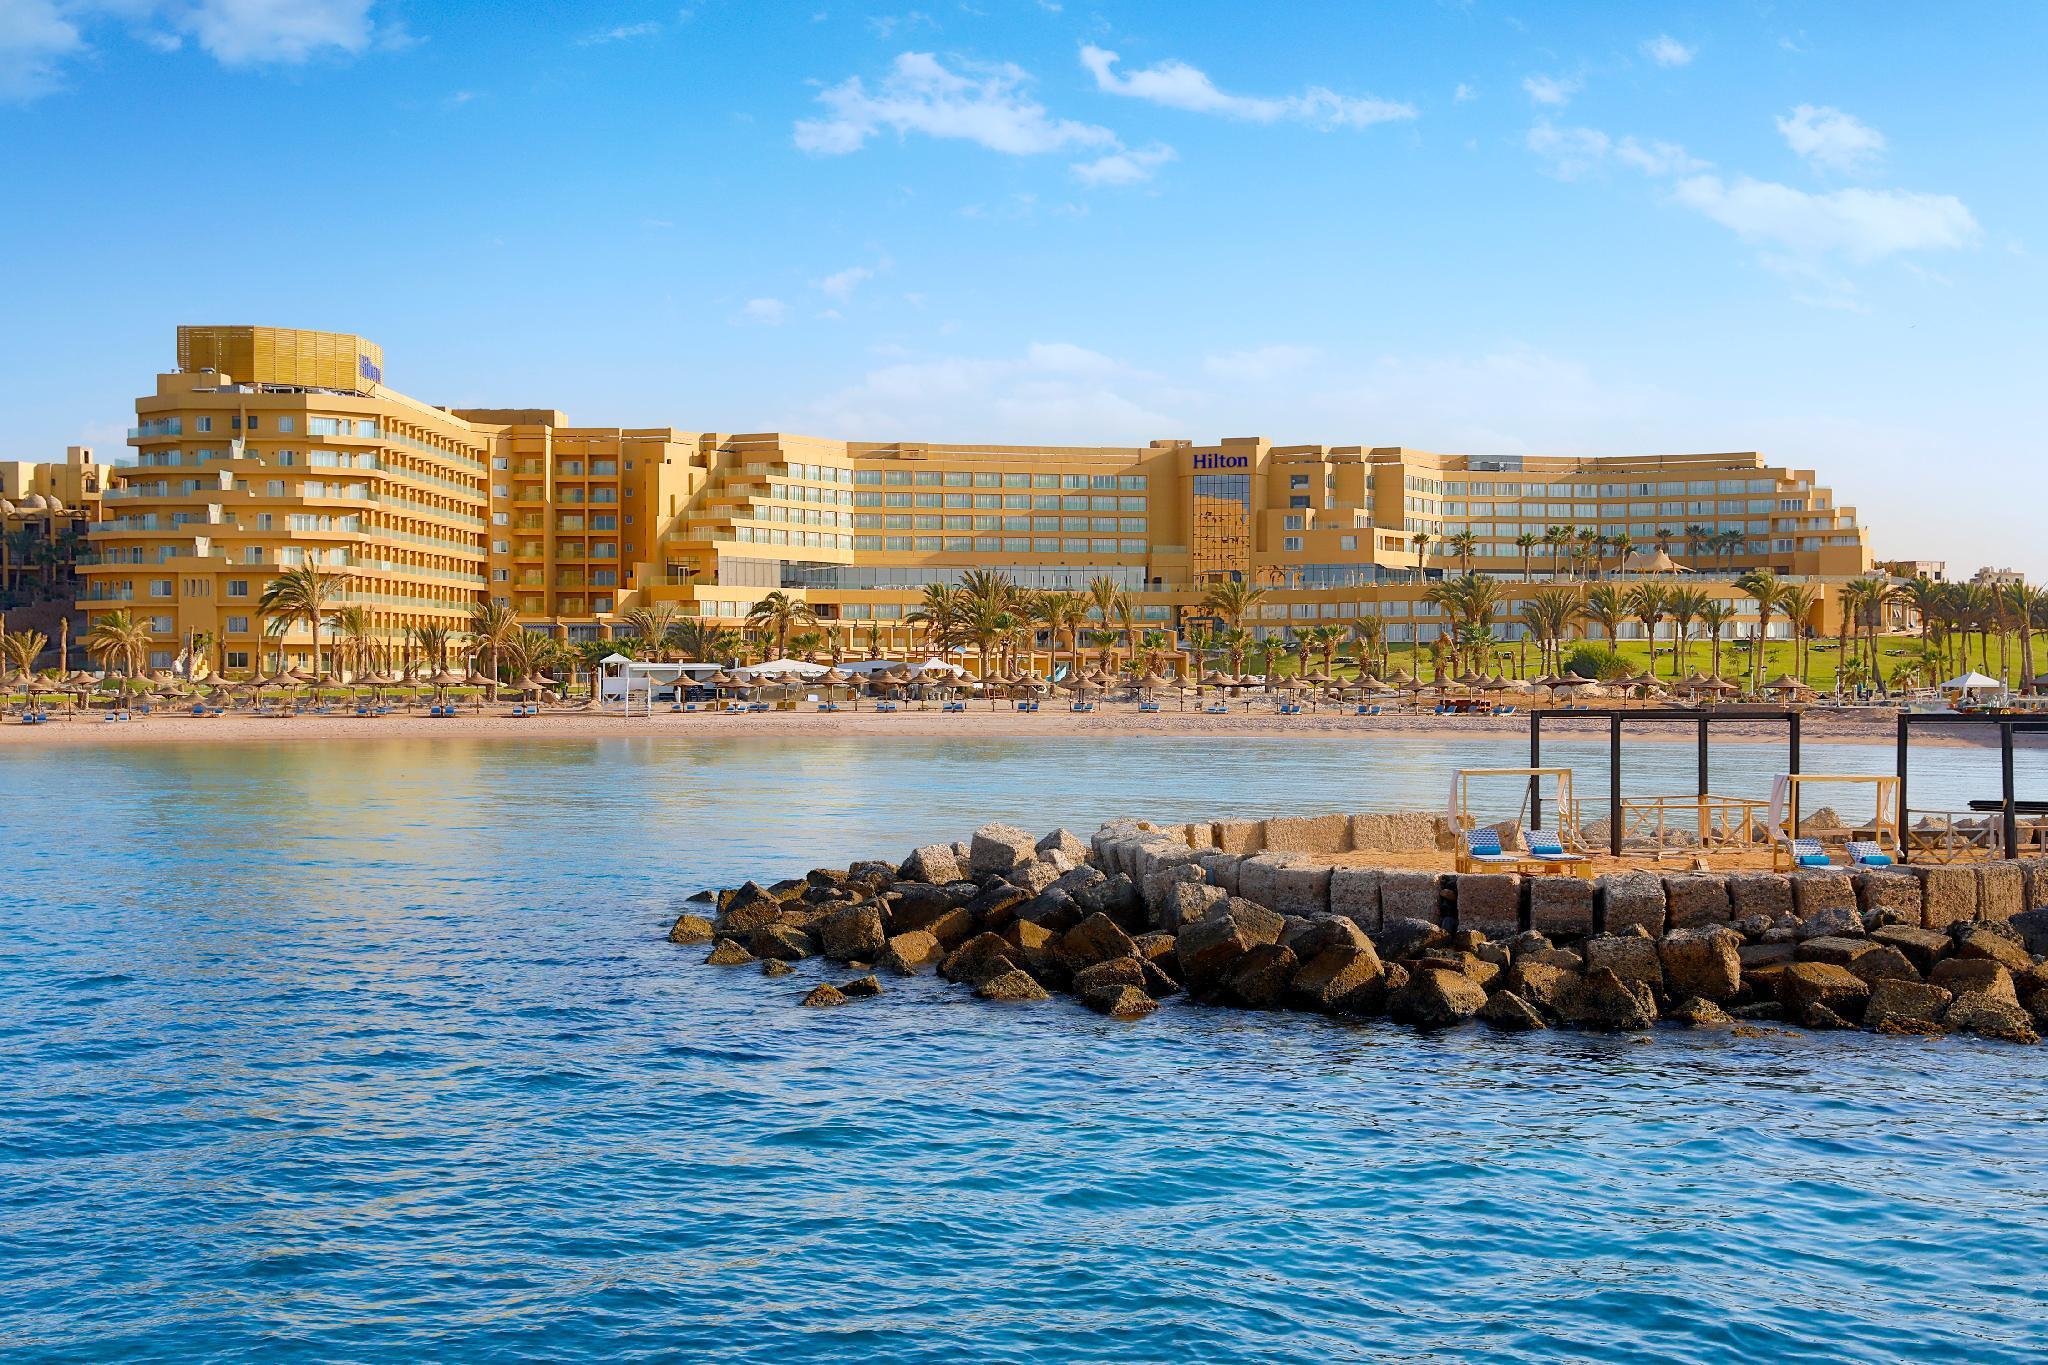 Hilton Hurghada Plaza Hotel